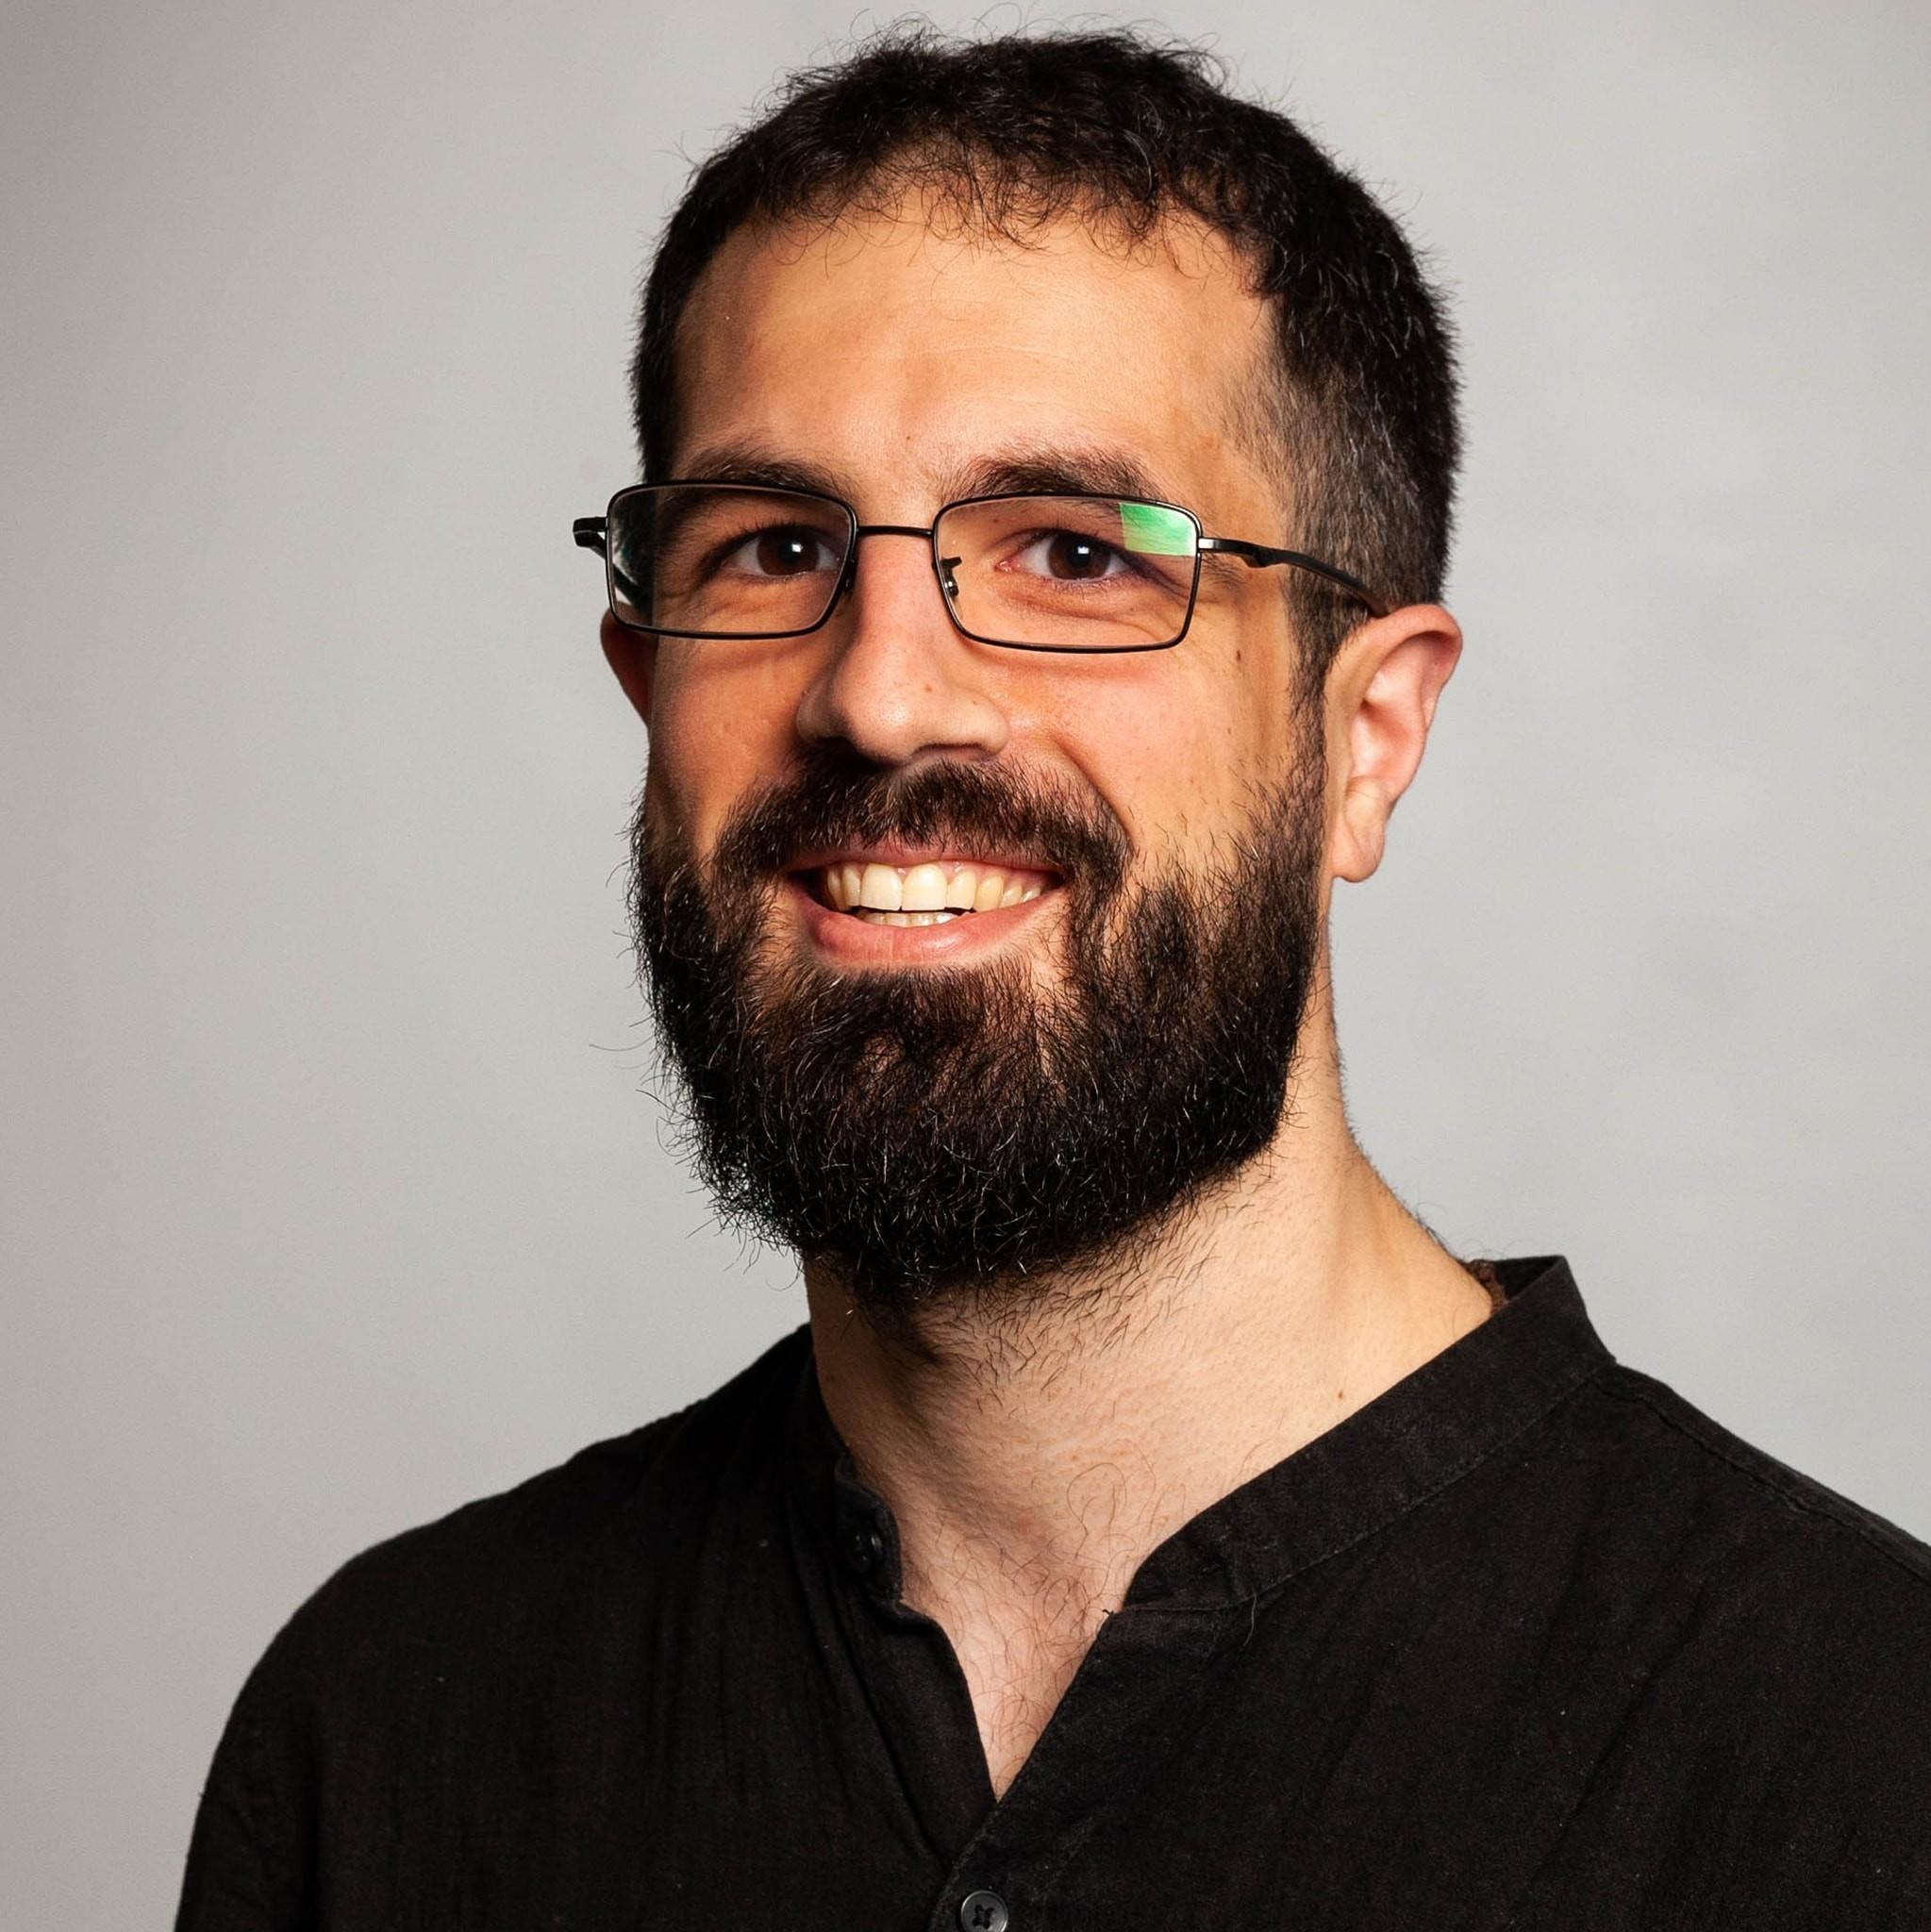 Paulo Vázquez Acosta